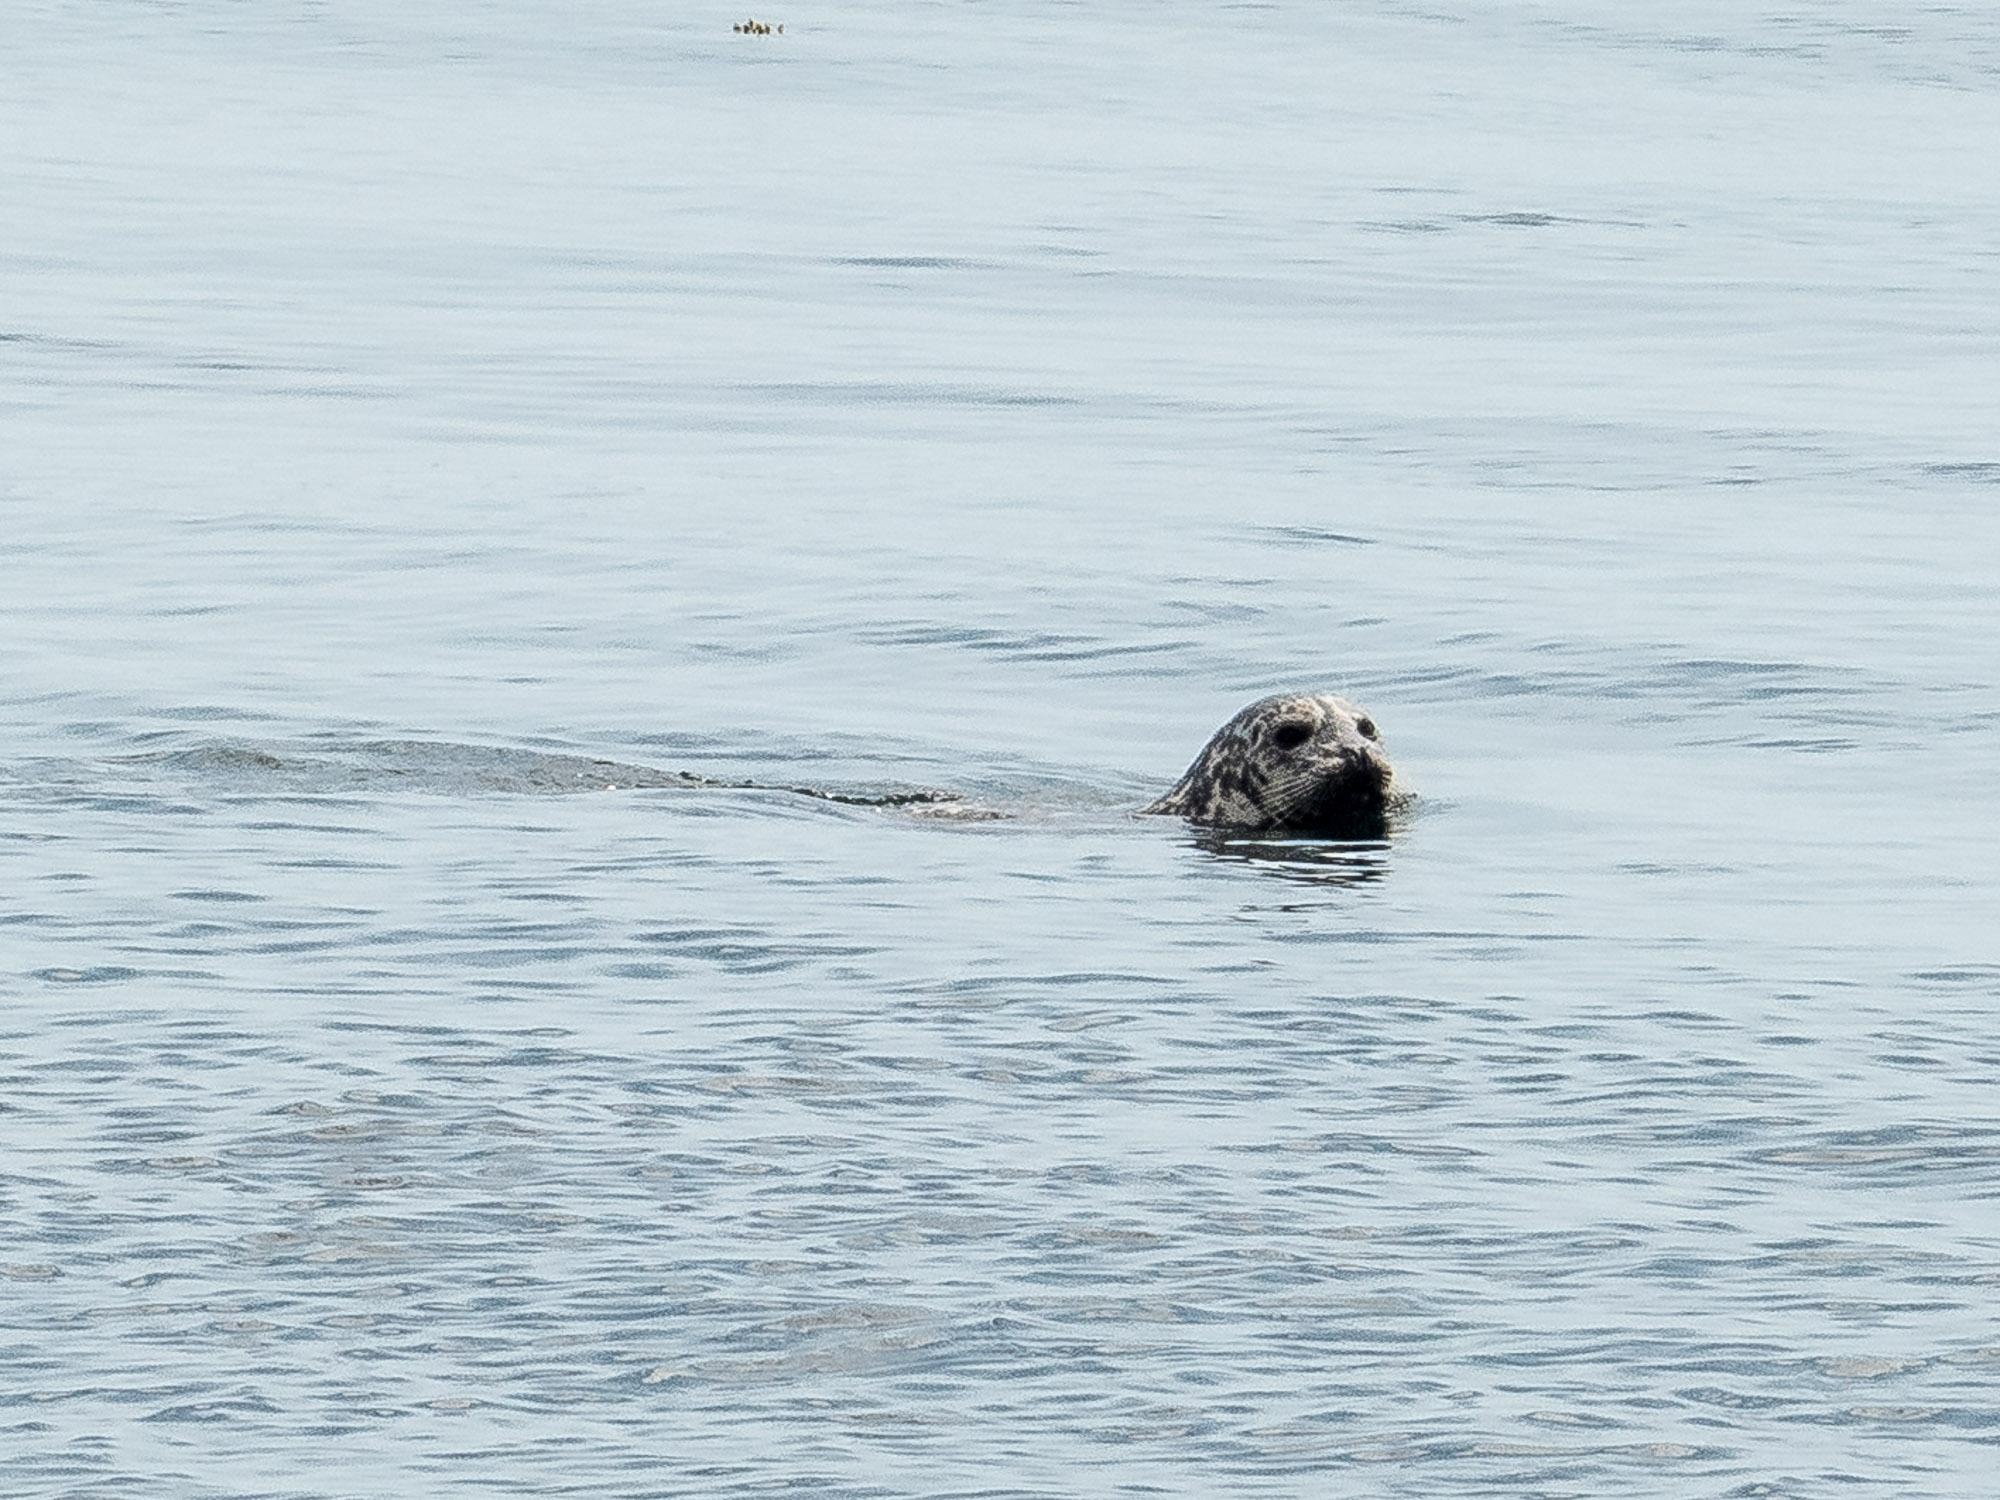 Leopard seal near Lime Kiln lighthouse